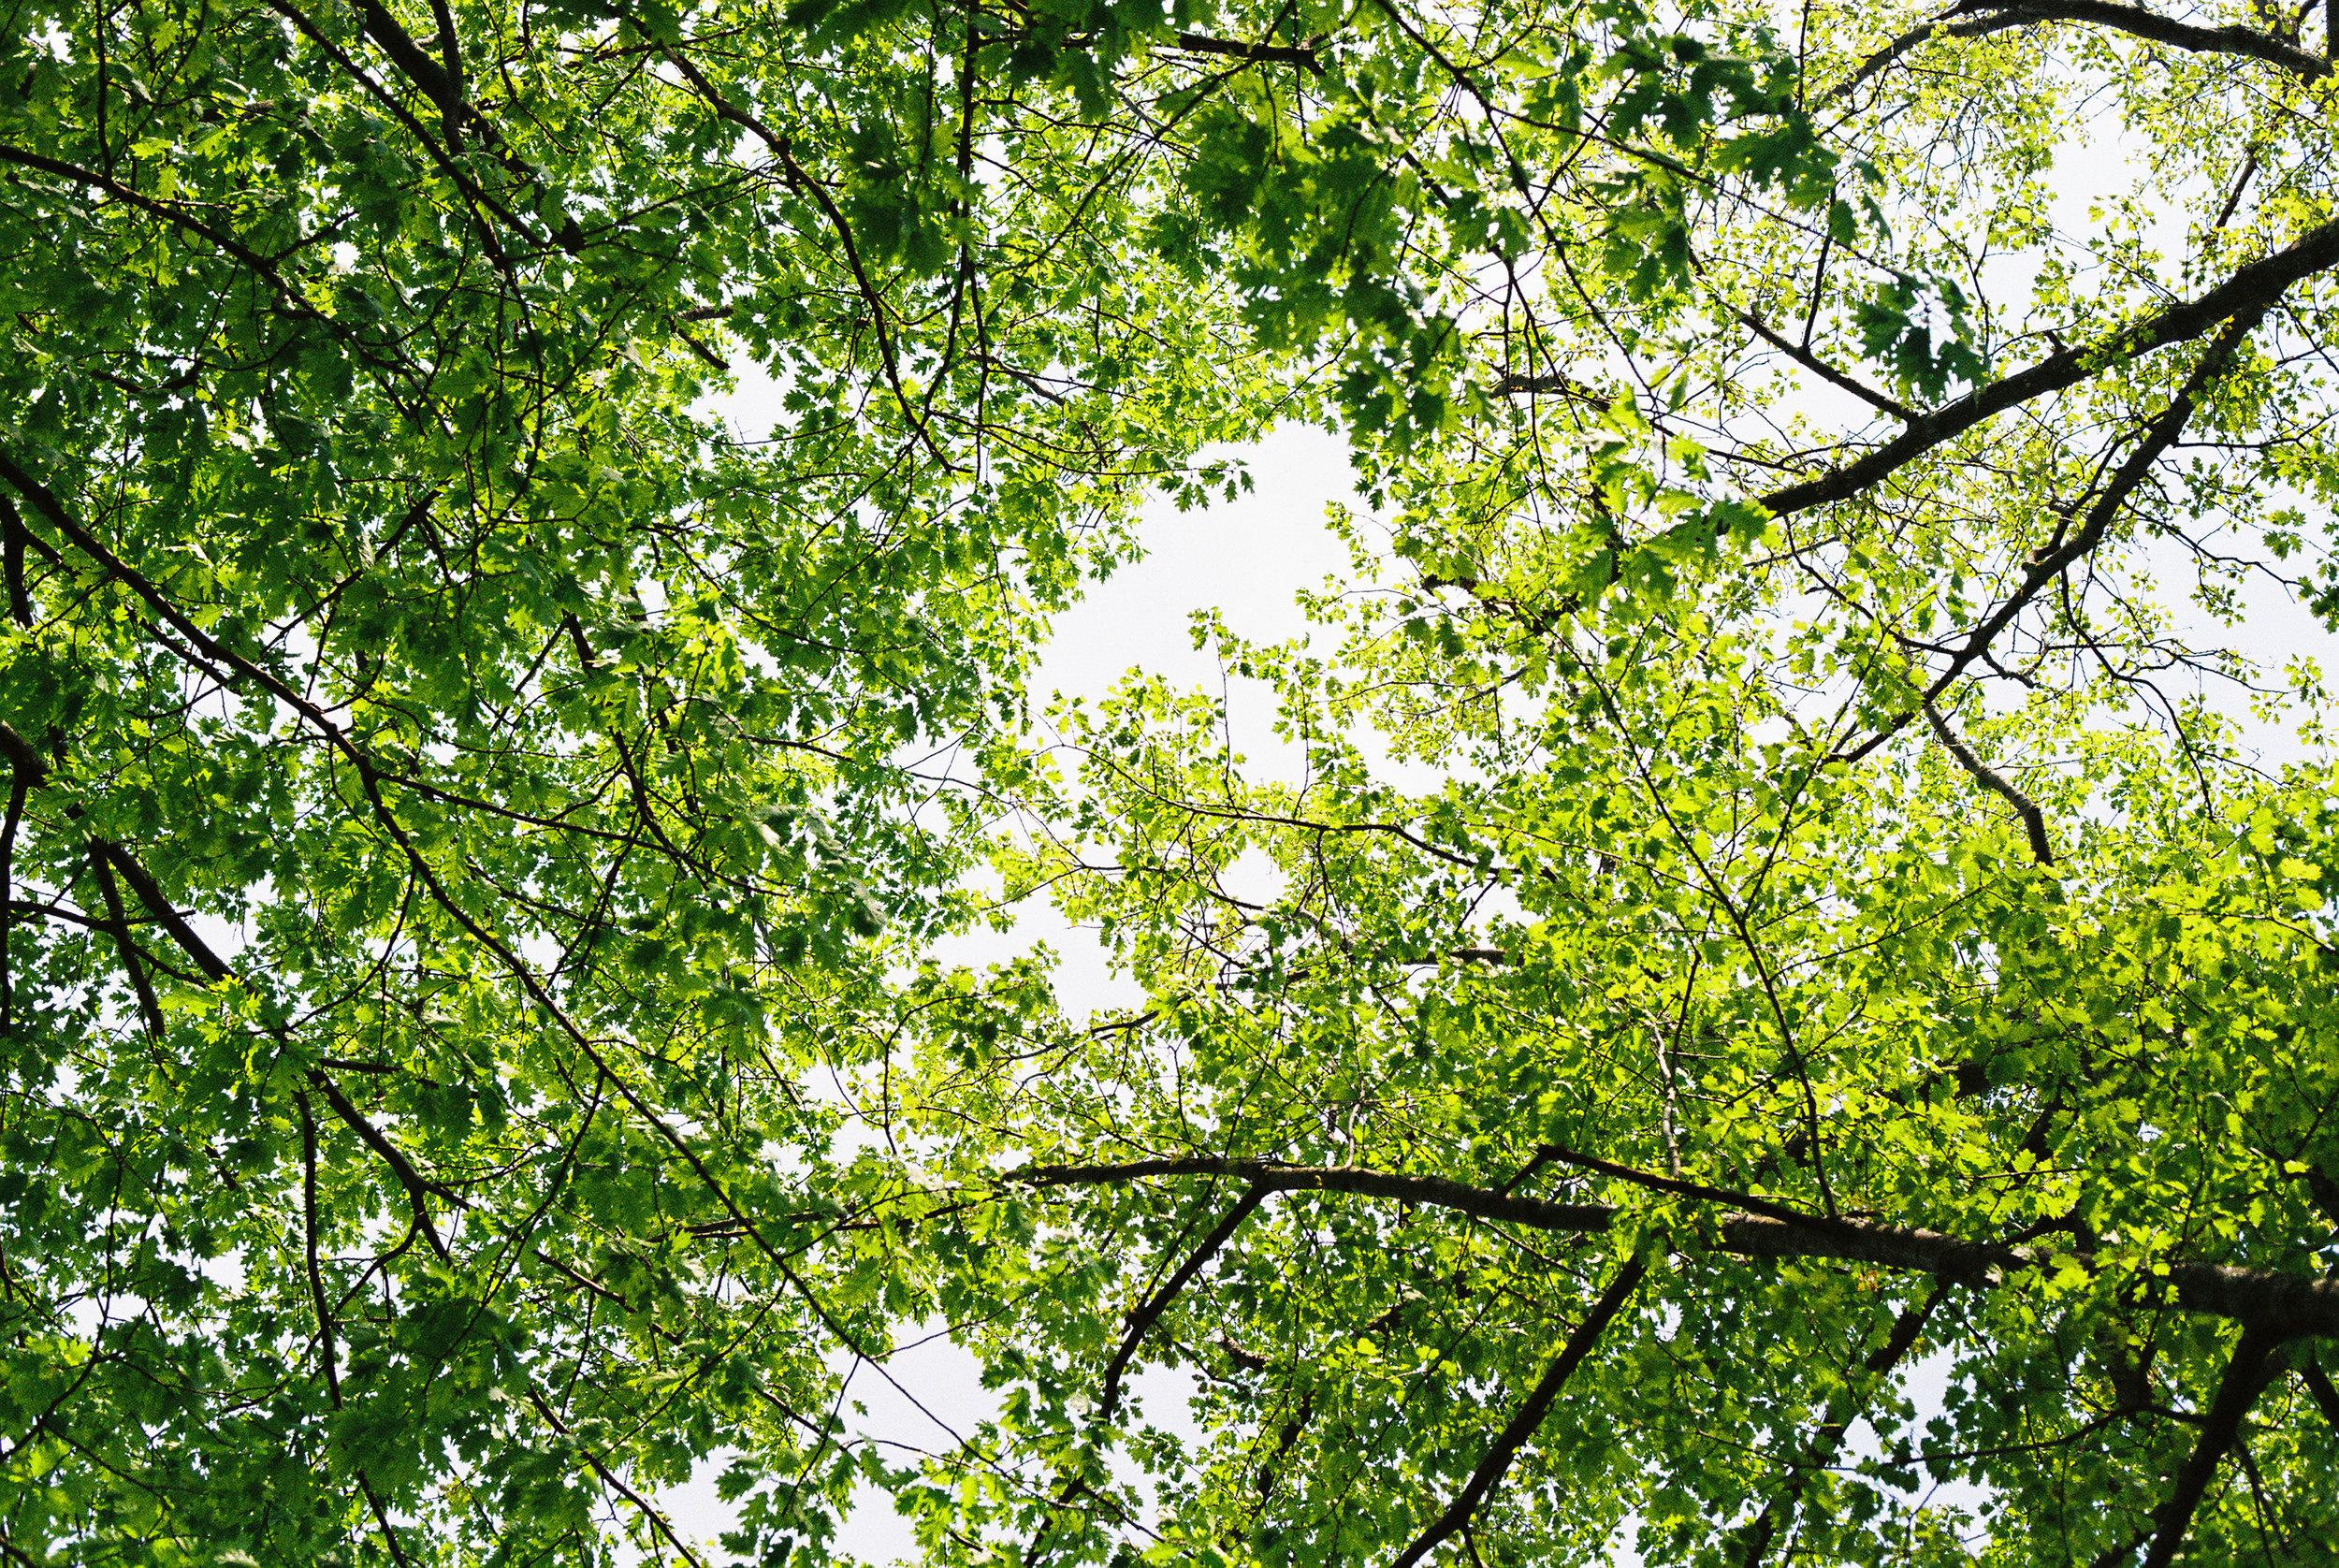 Upwards through the trees